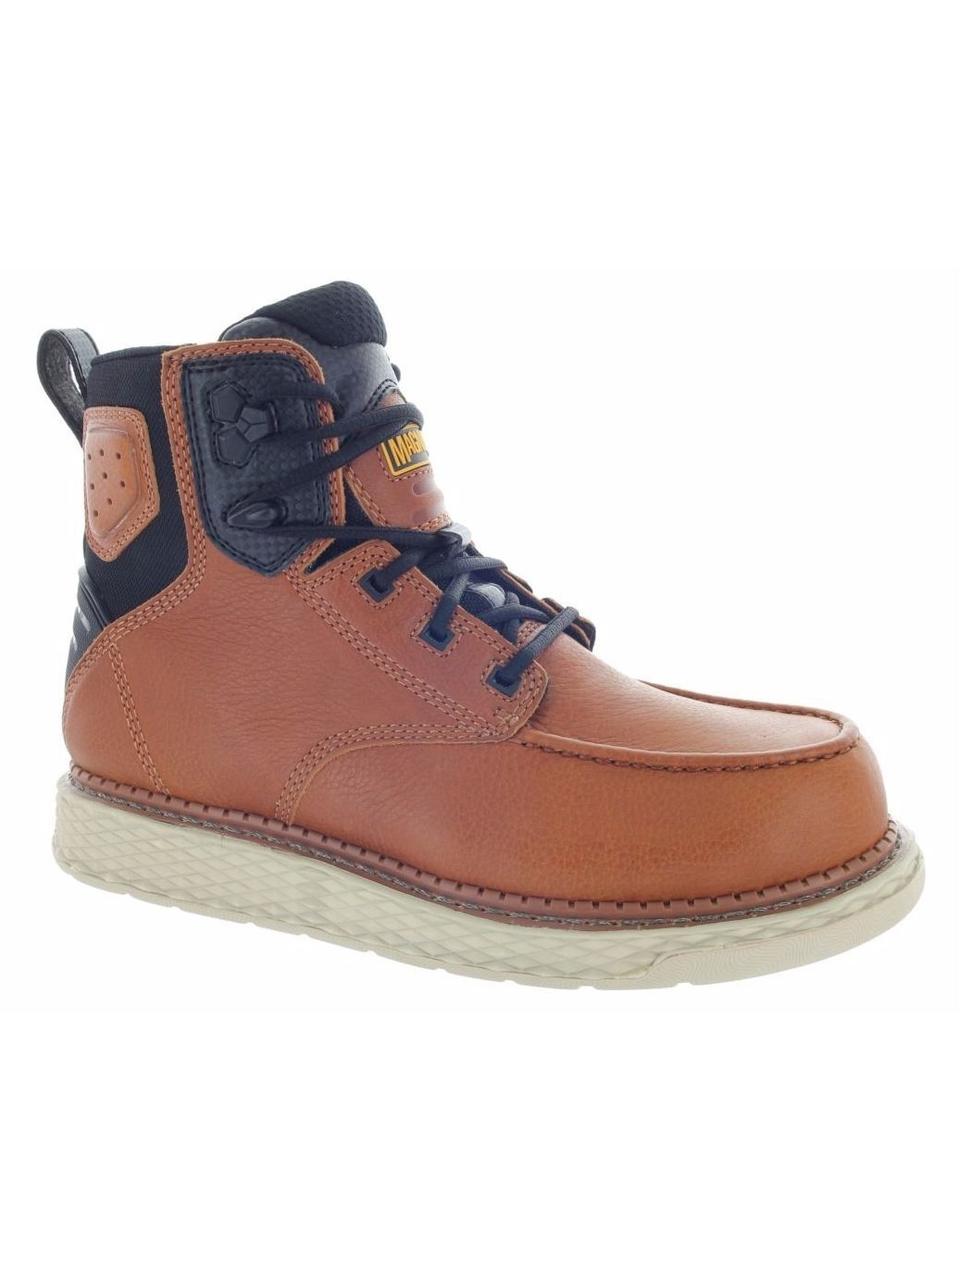 Magnum Stockton 6.0 Tan Work Boots - Price Breaker